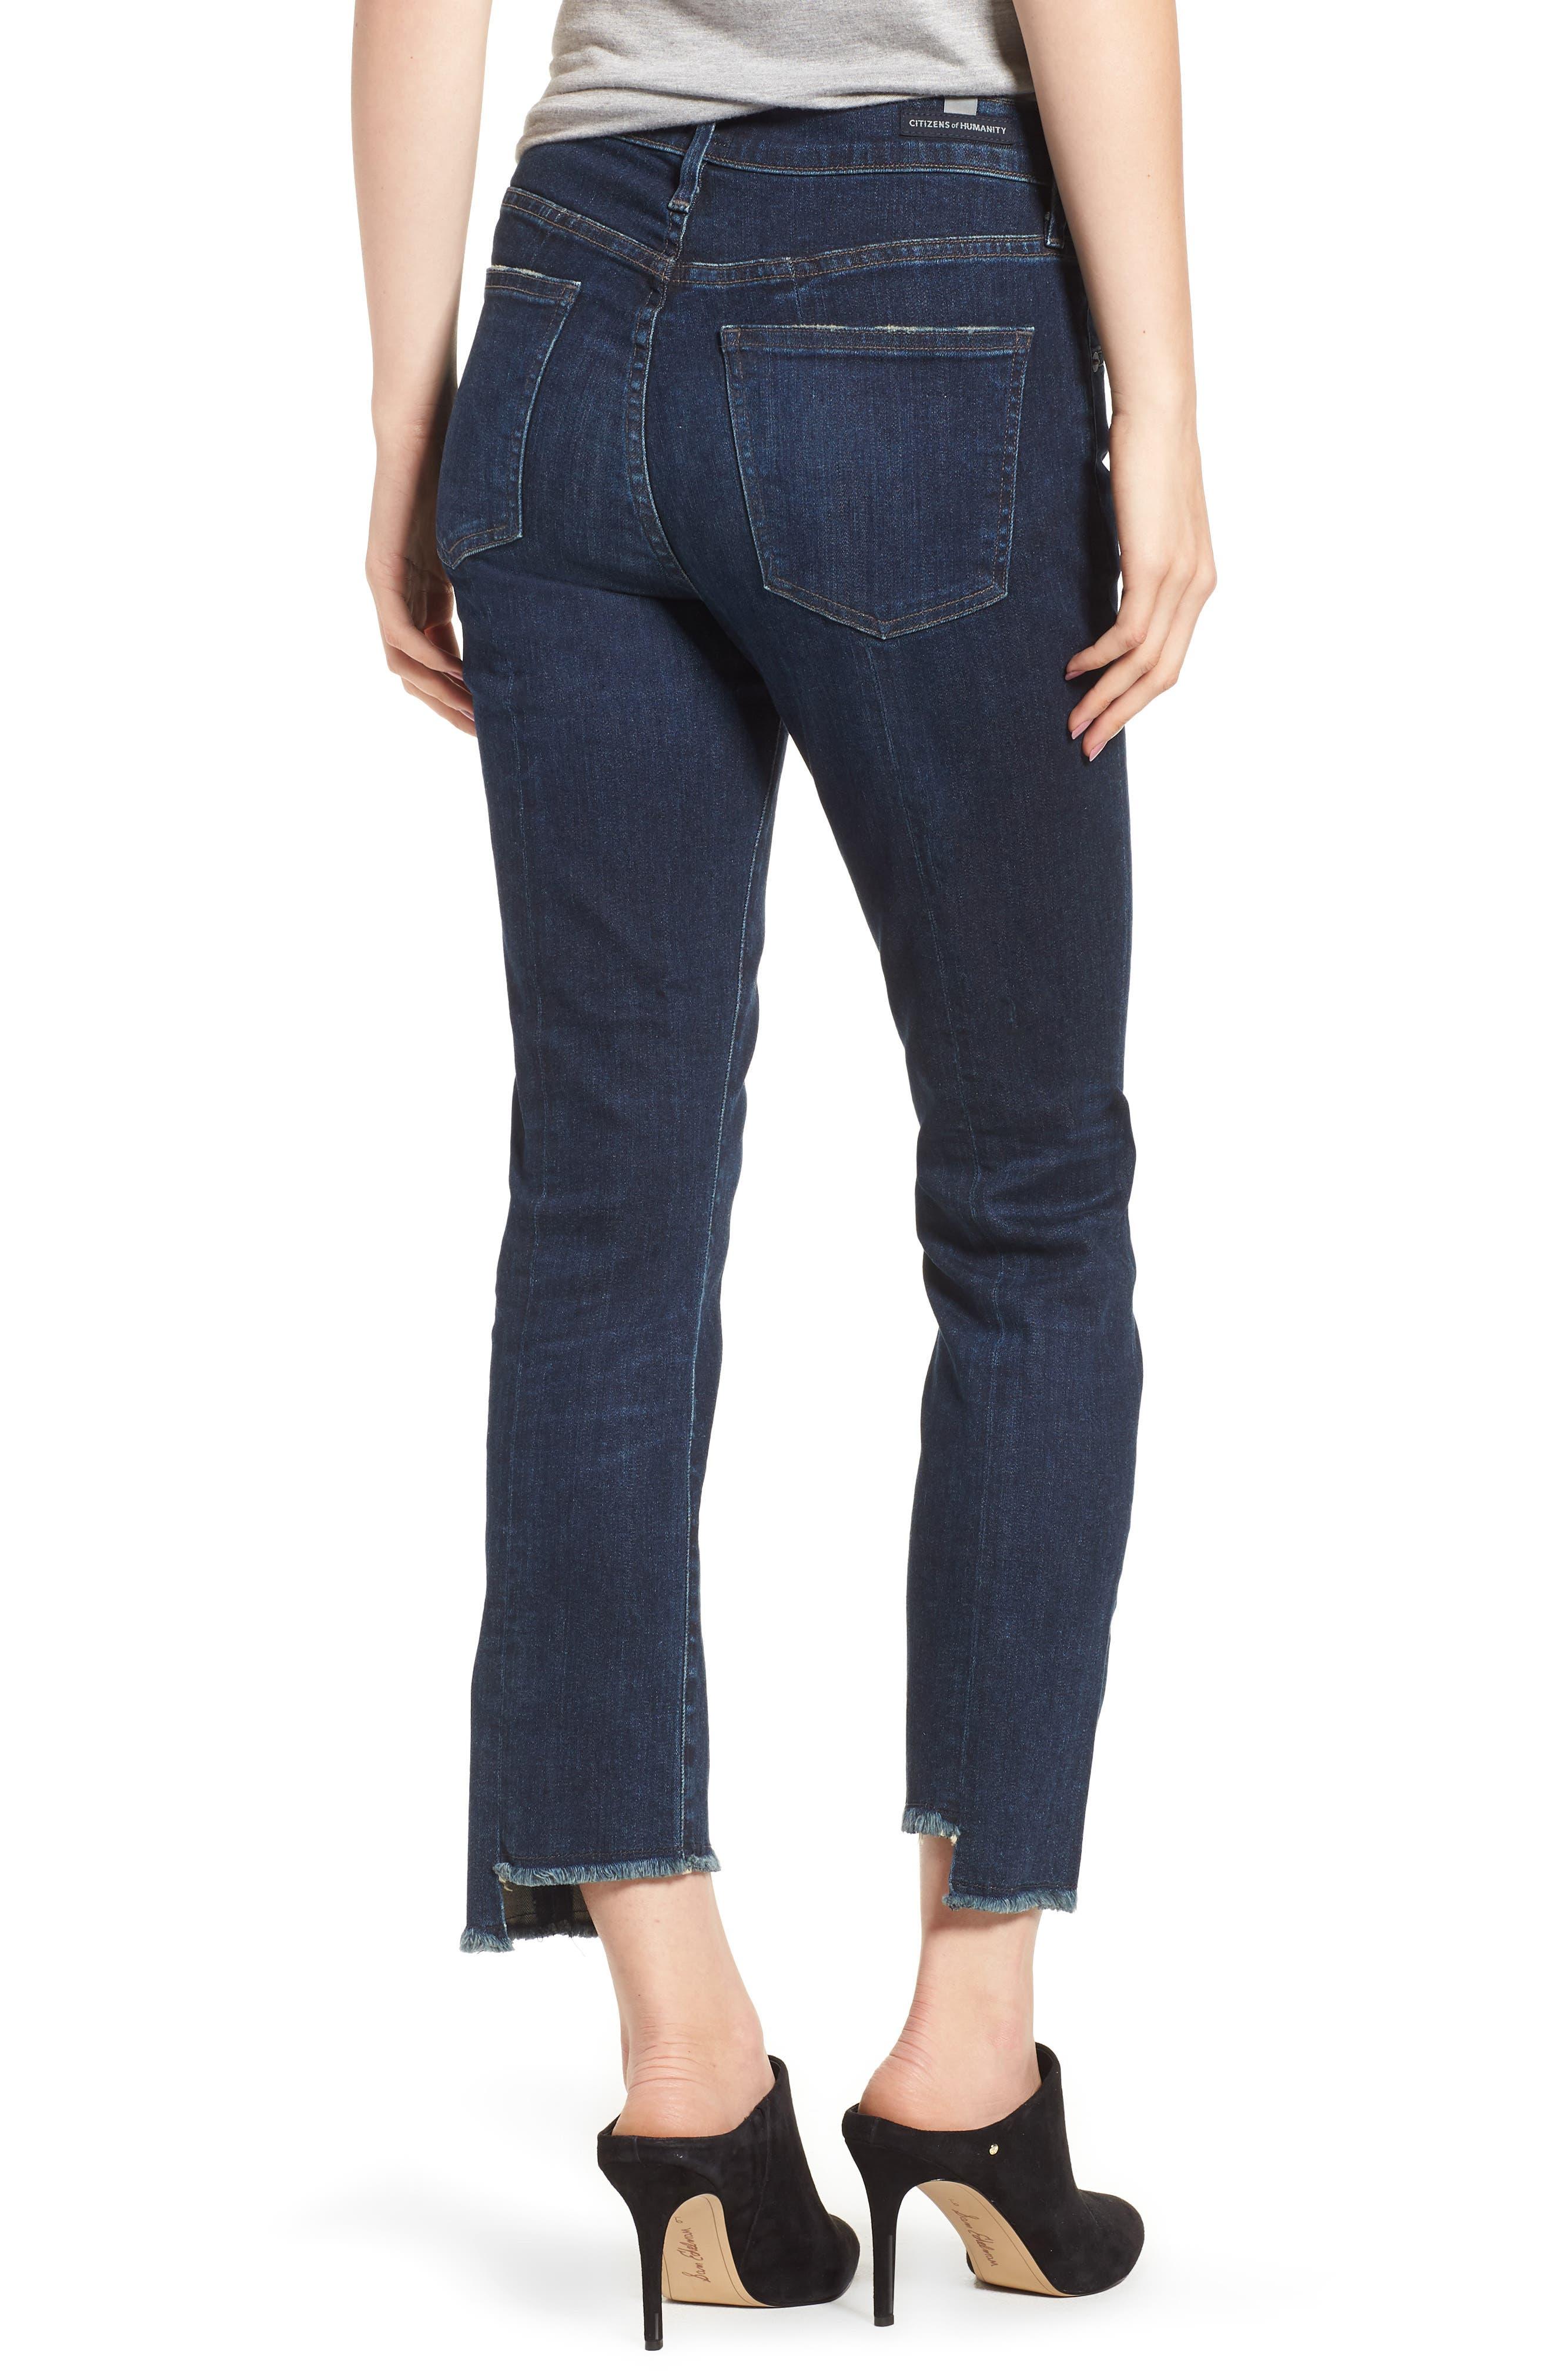 Amari Ankle Skinny Jeans,                             Alternate thumbnail 2, color,                             Maya